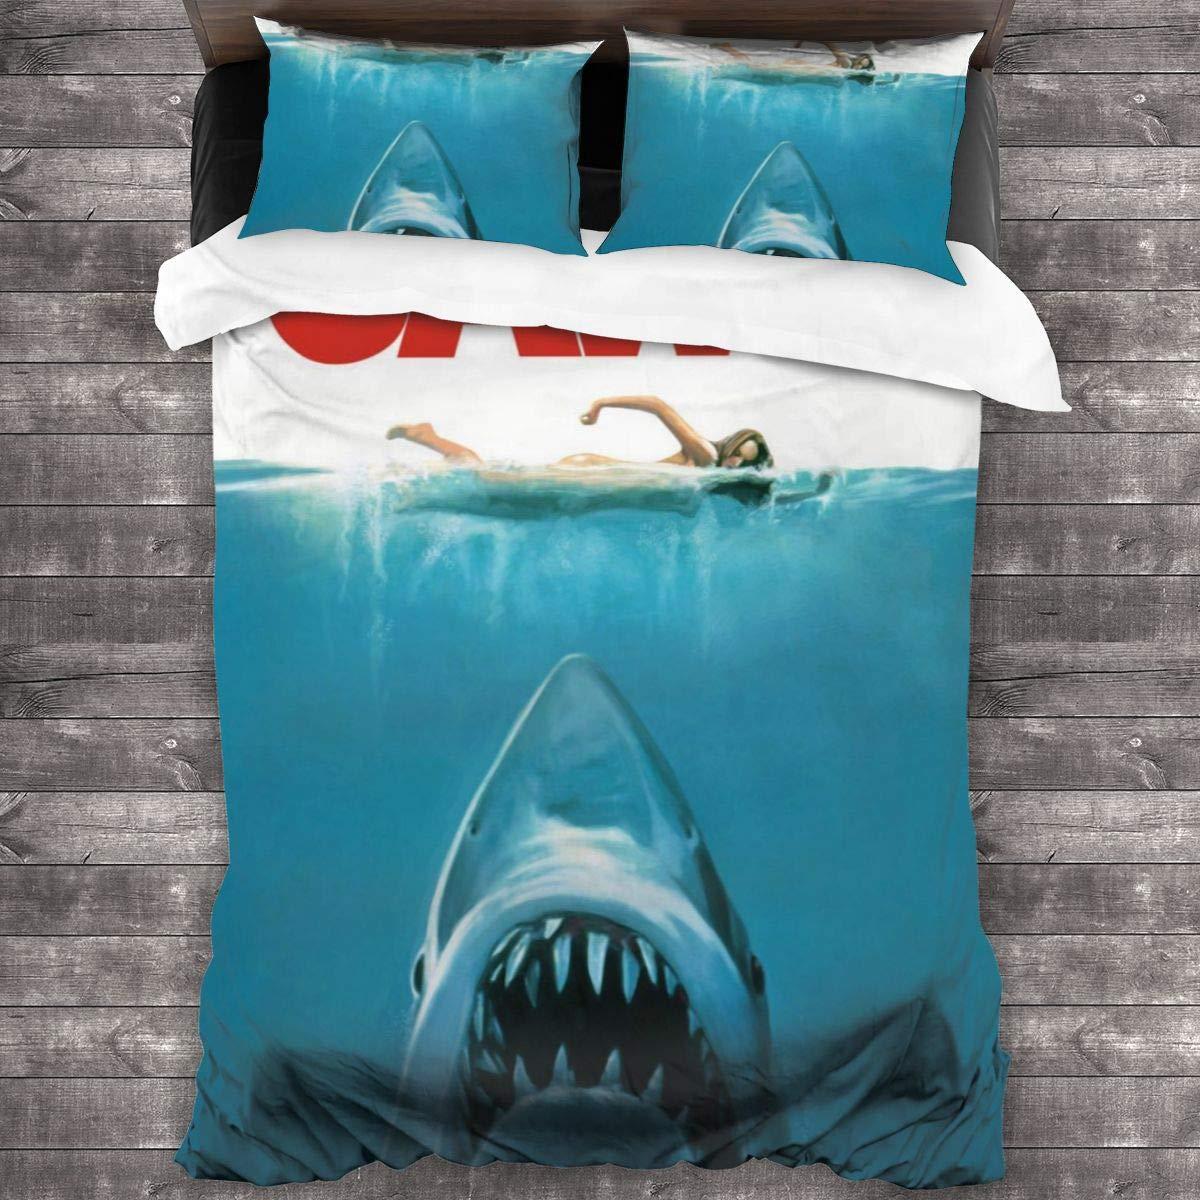 Nicokee 3 Piece Comforter Set Jaws Biting Shark Naked Girl Swimming Bedding Set Duvet Cover and Pillowcase Bedroom Three-Piece Bedding Room Decor for Adult Women Men Teens